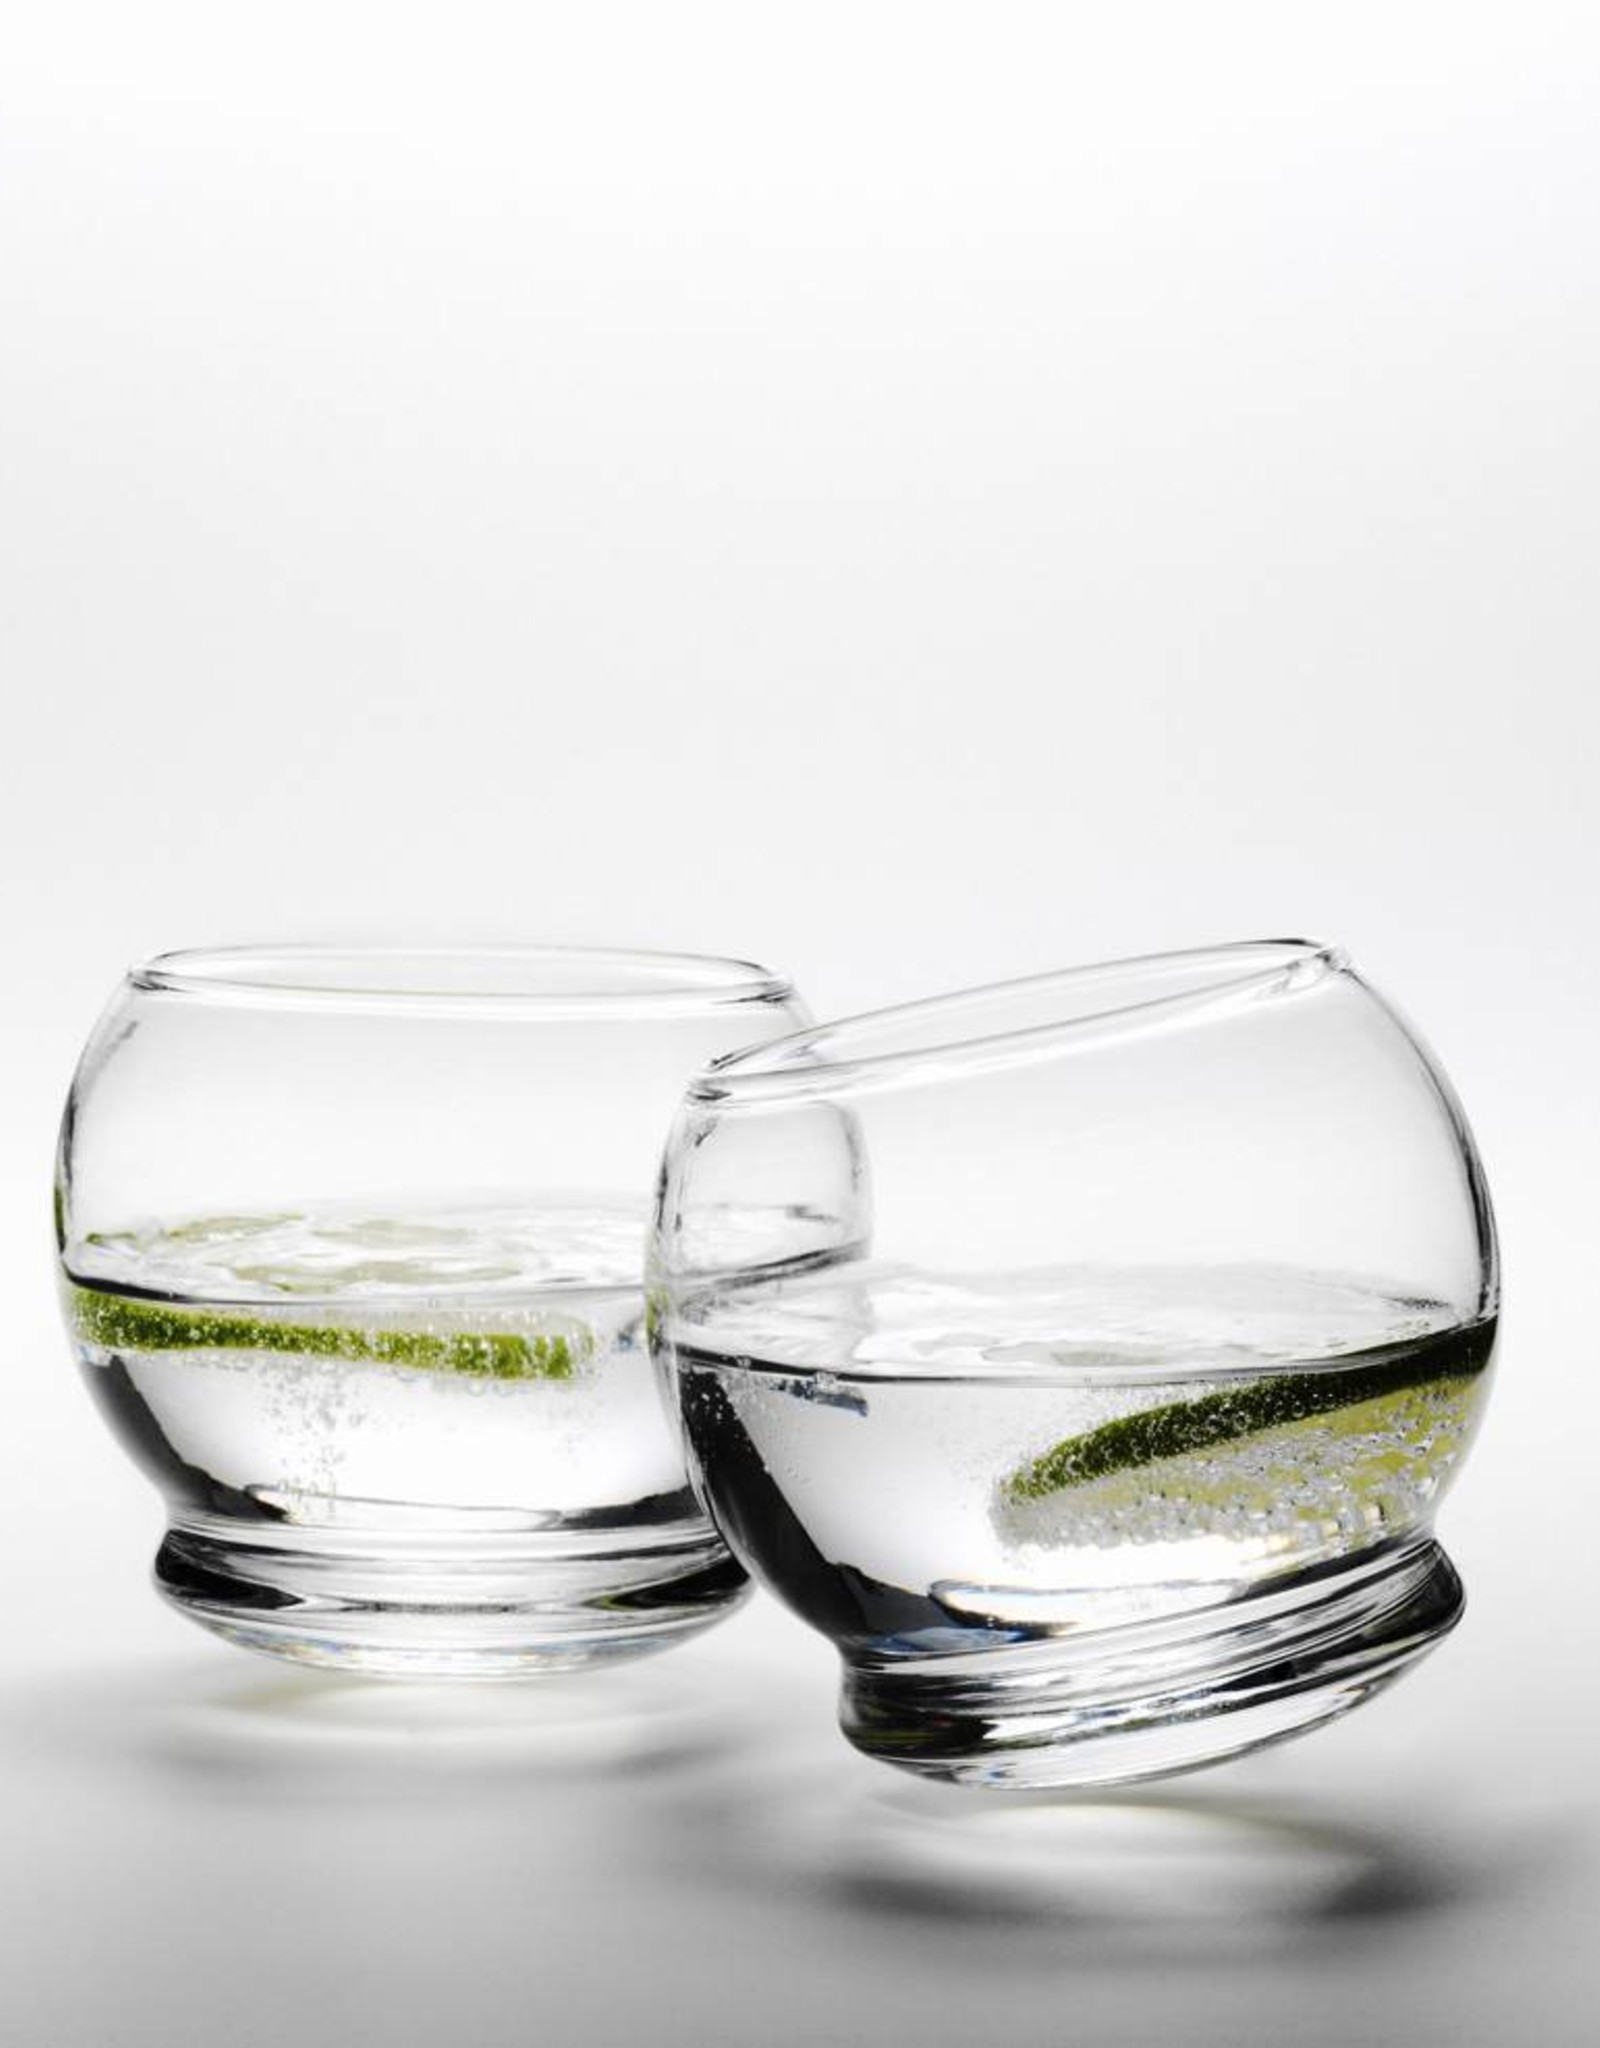 Normann Copenhagen Rocking glass set van 4